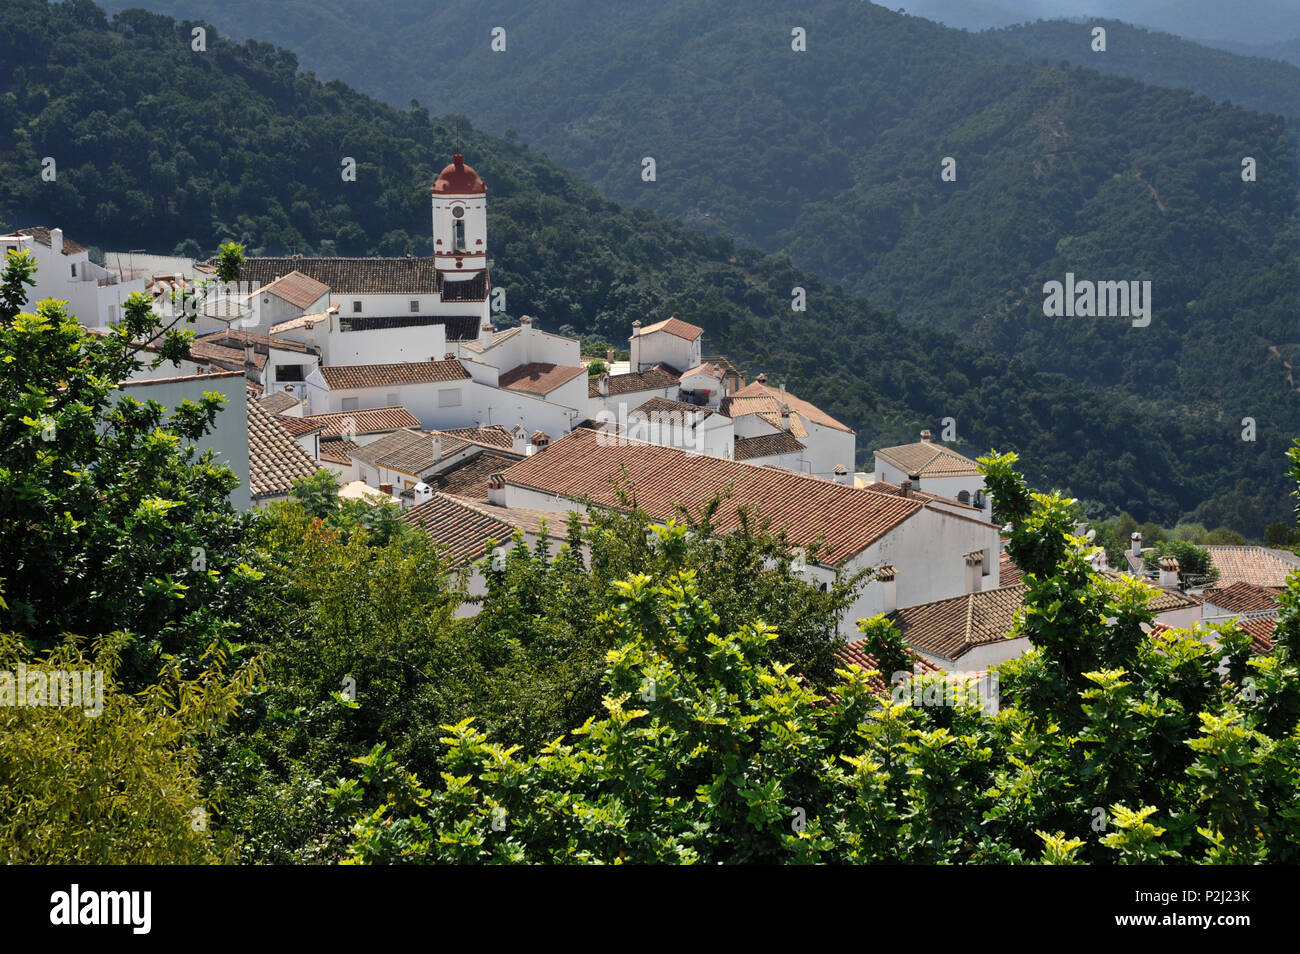 Genalguacil in the Serrania de Ronda, Andalusia, Spain - Stock Image